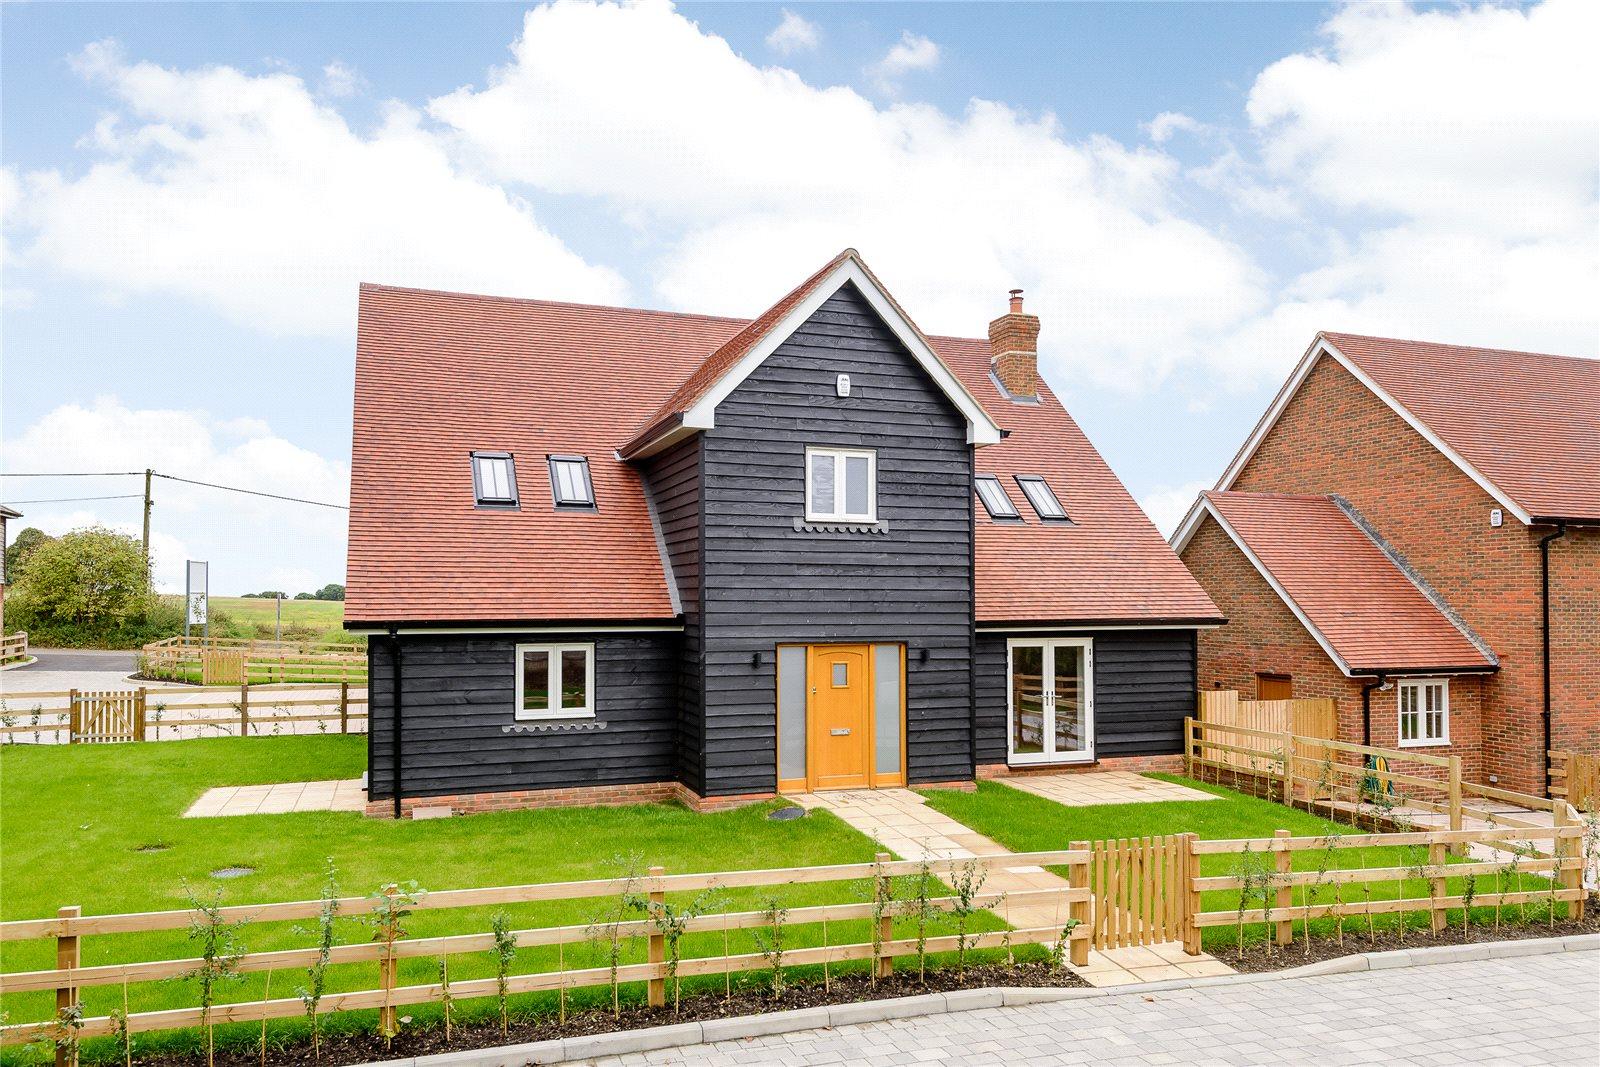 Casa Unifamiliar por un Venta en Wood Hill Lane, Long Sutton, Hook, Hampshire, RG29 Hook, Inglaterra